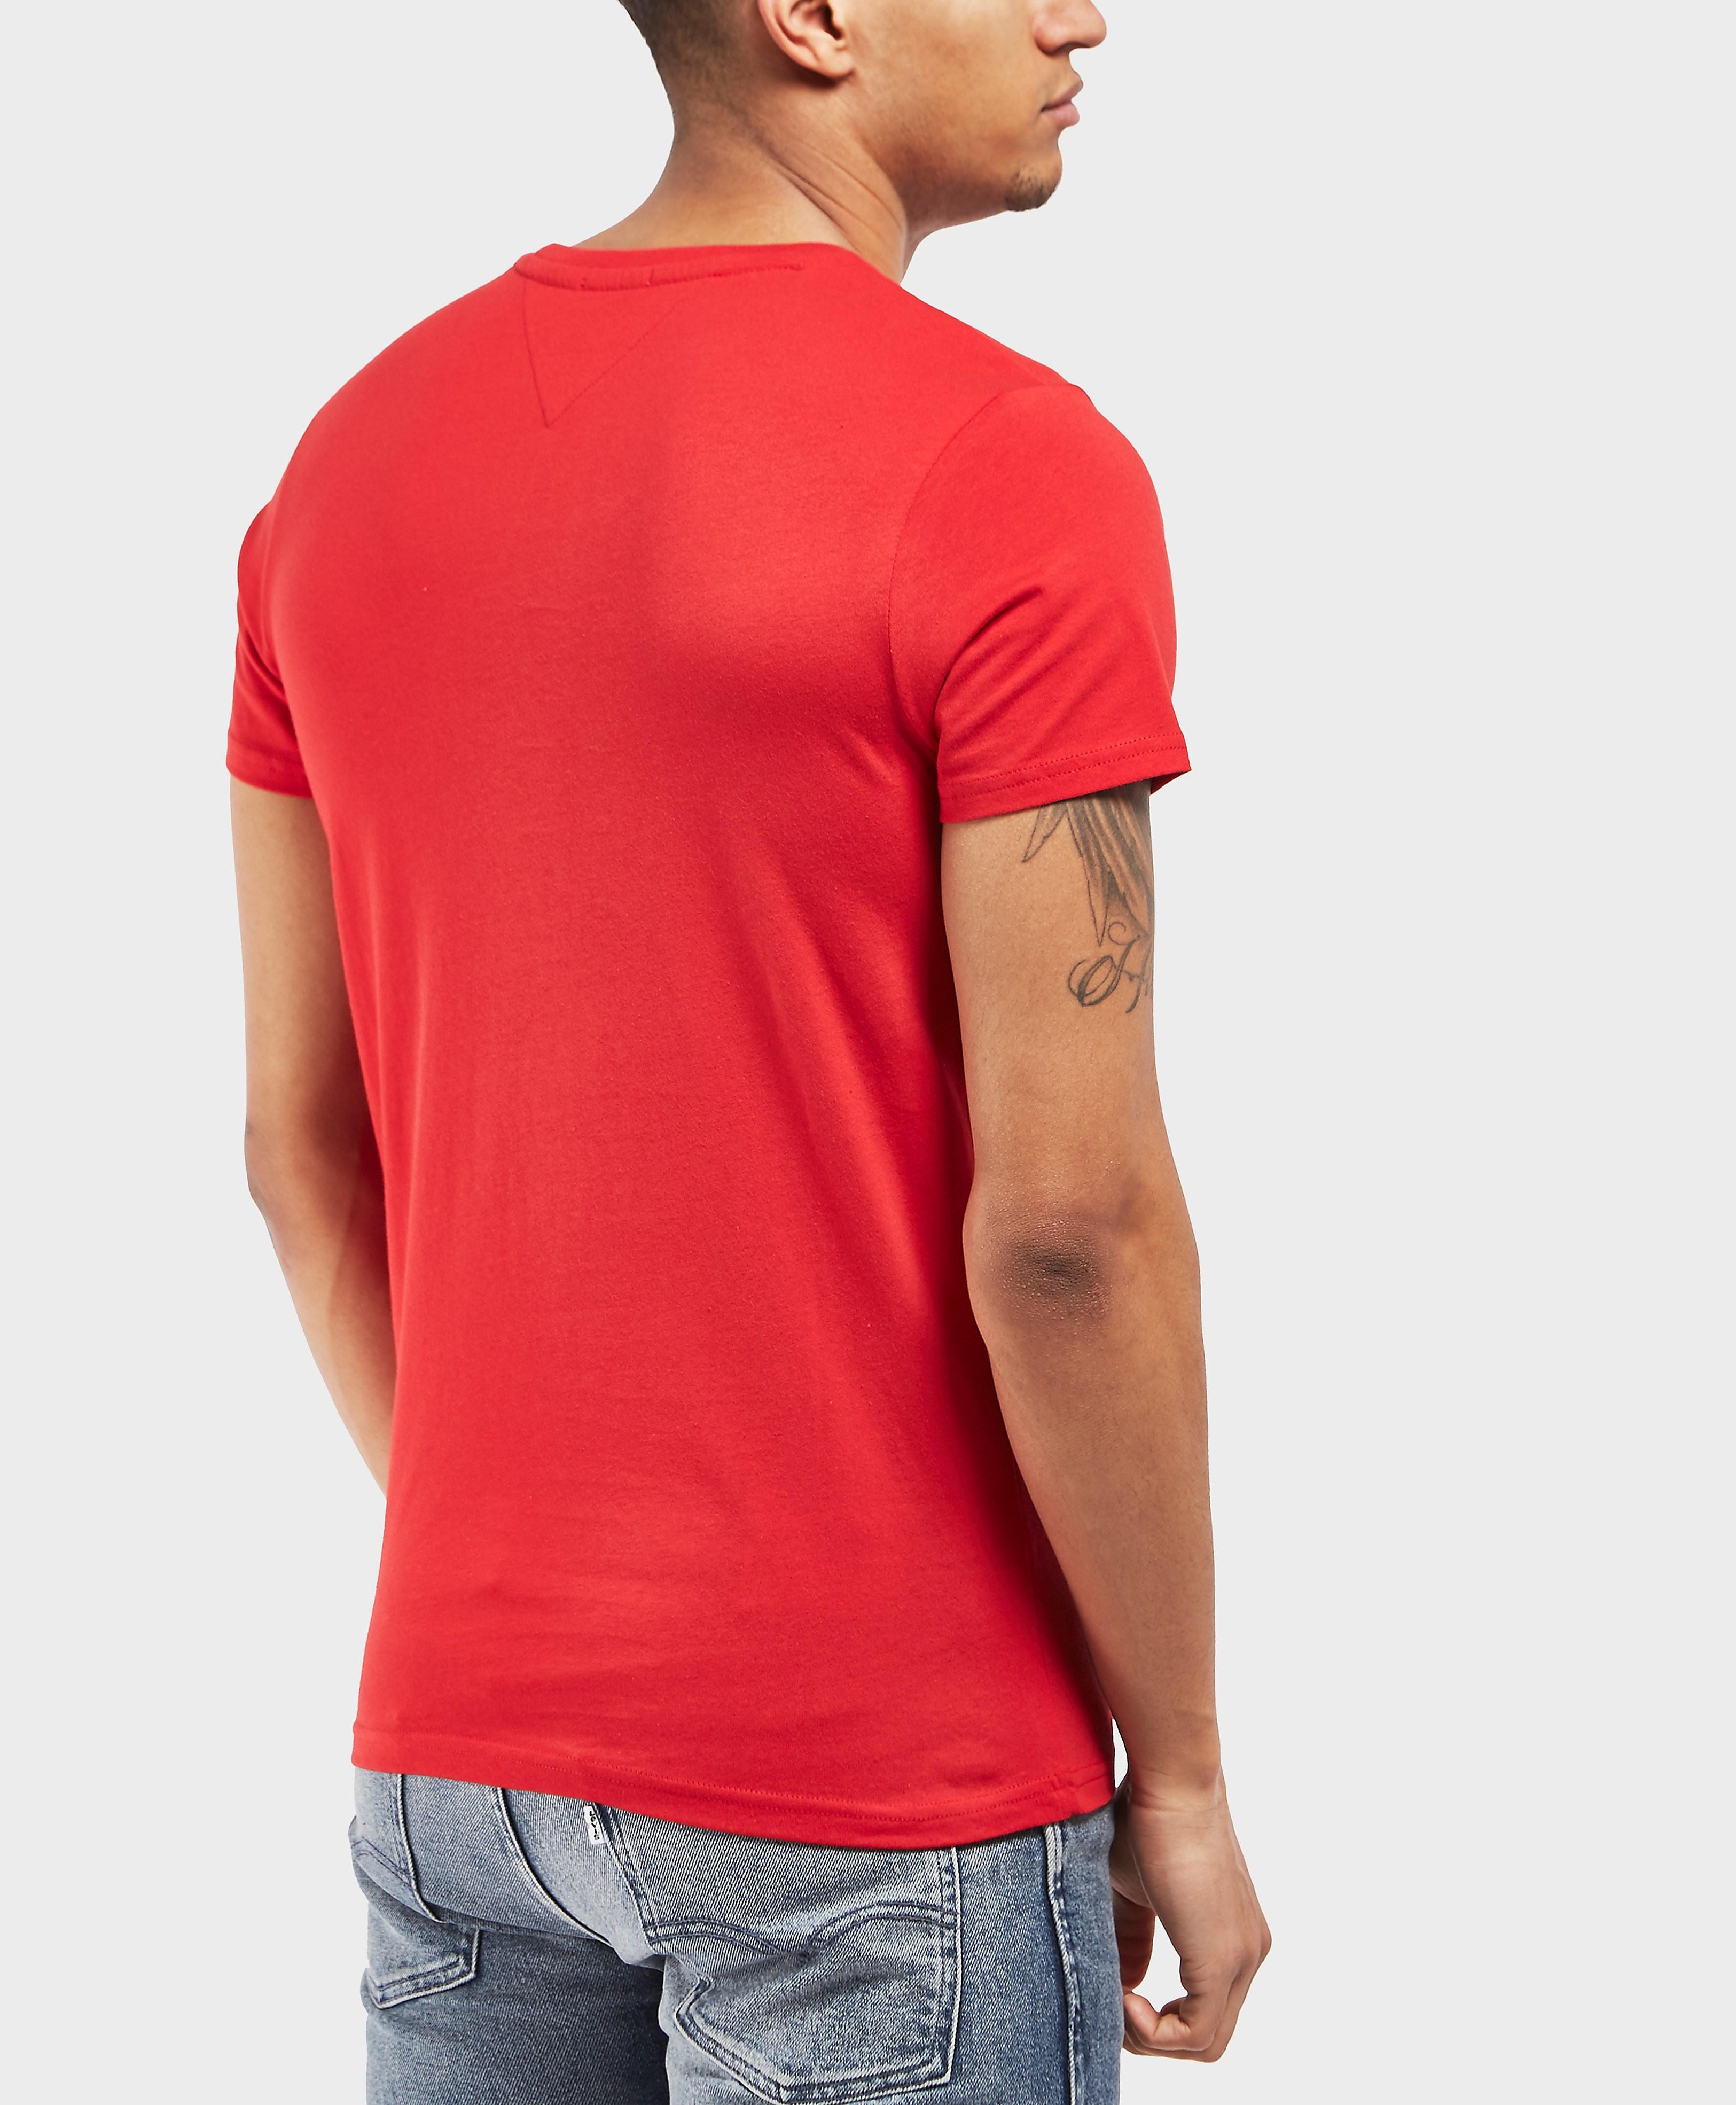 Tommy Hilfiger Crew Short Sleeve T-Shirt